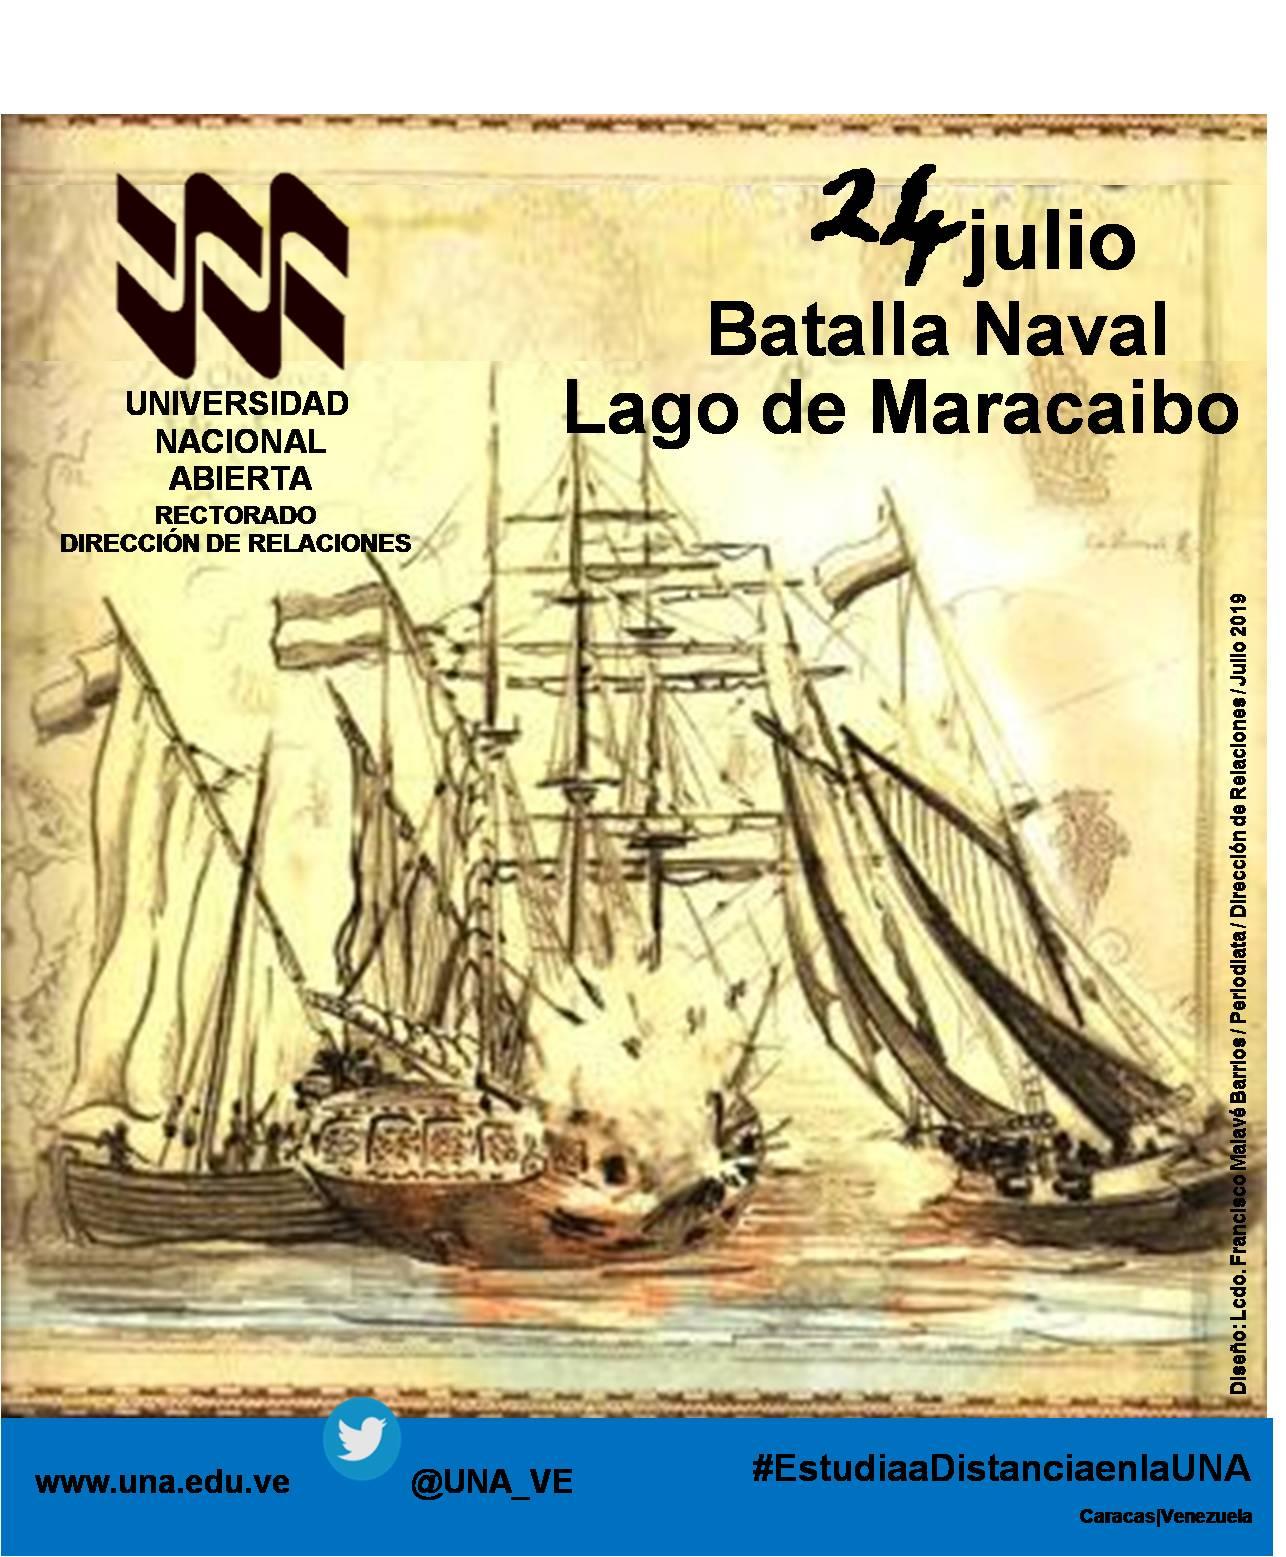 Dia de la Batalla Naval de Maracaibo